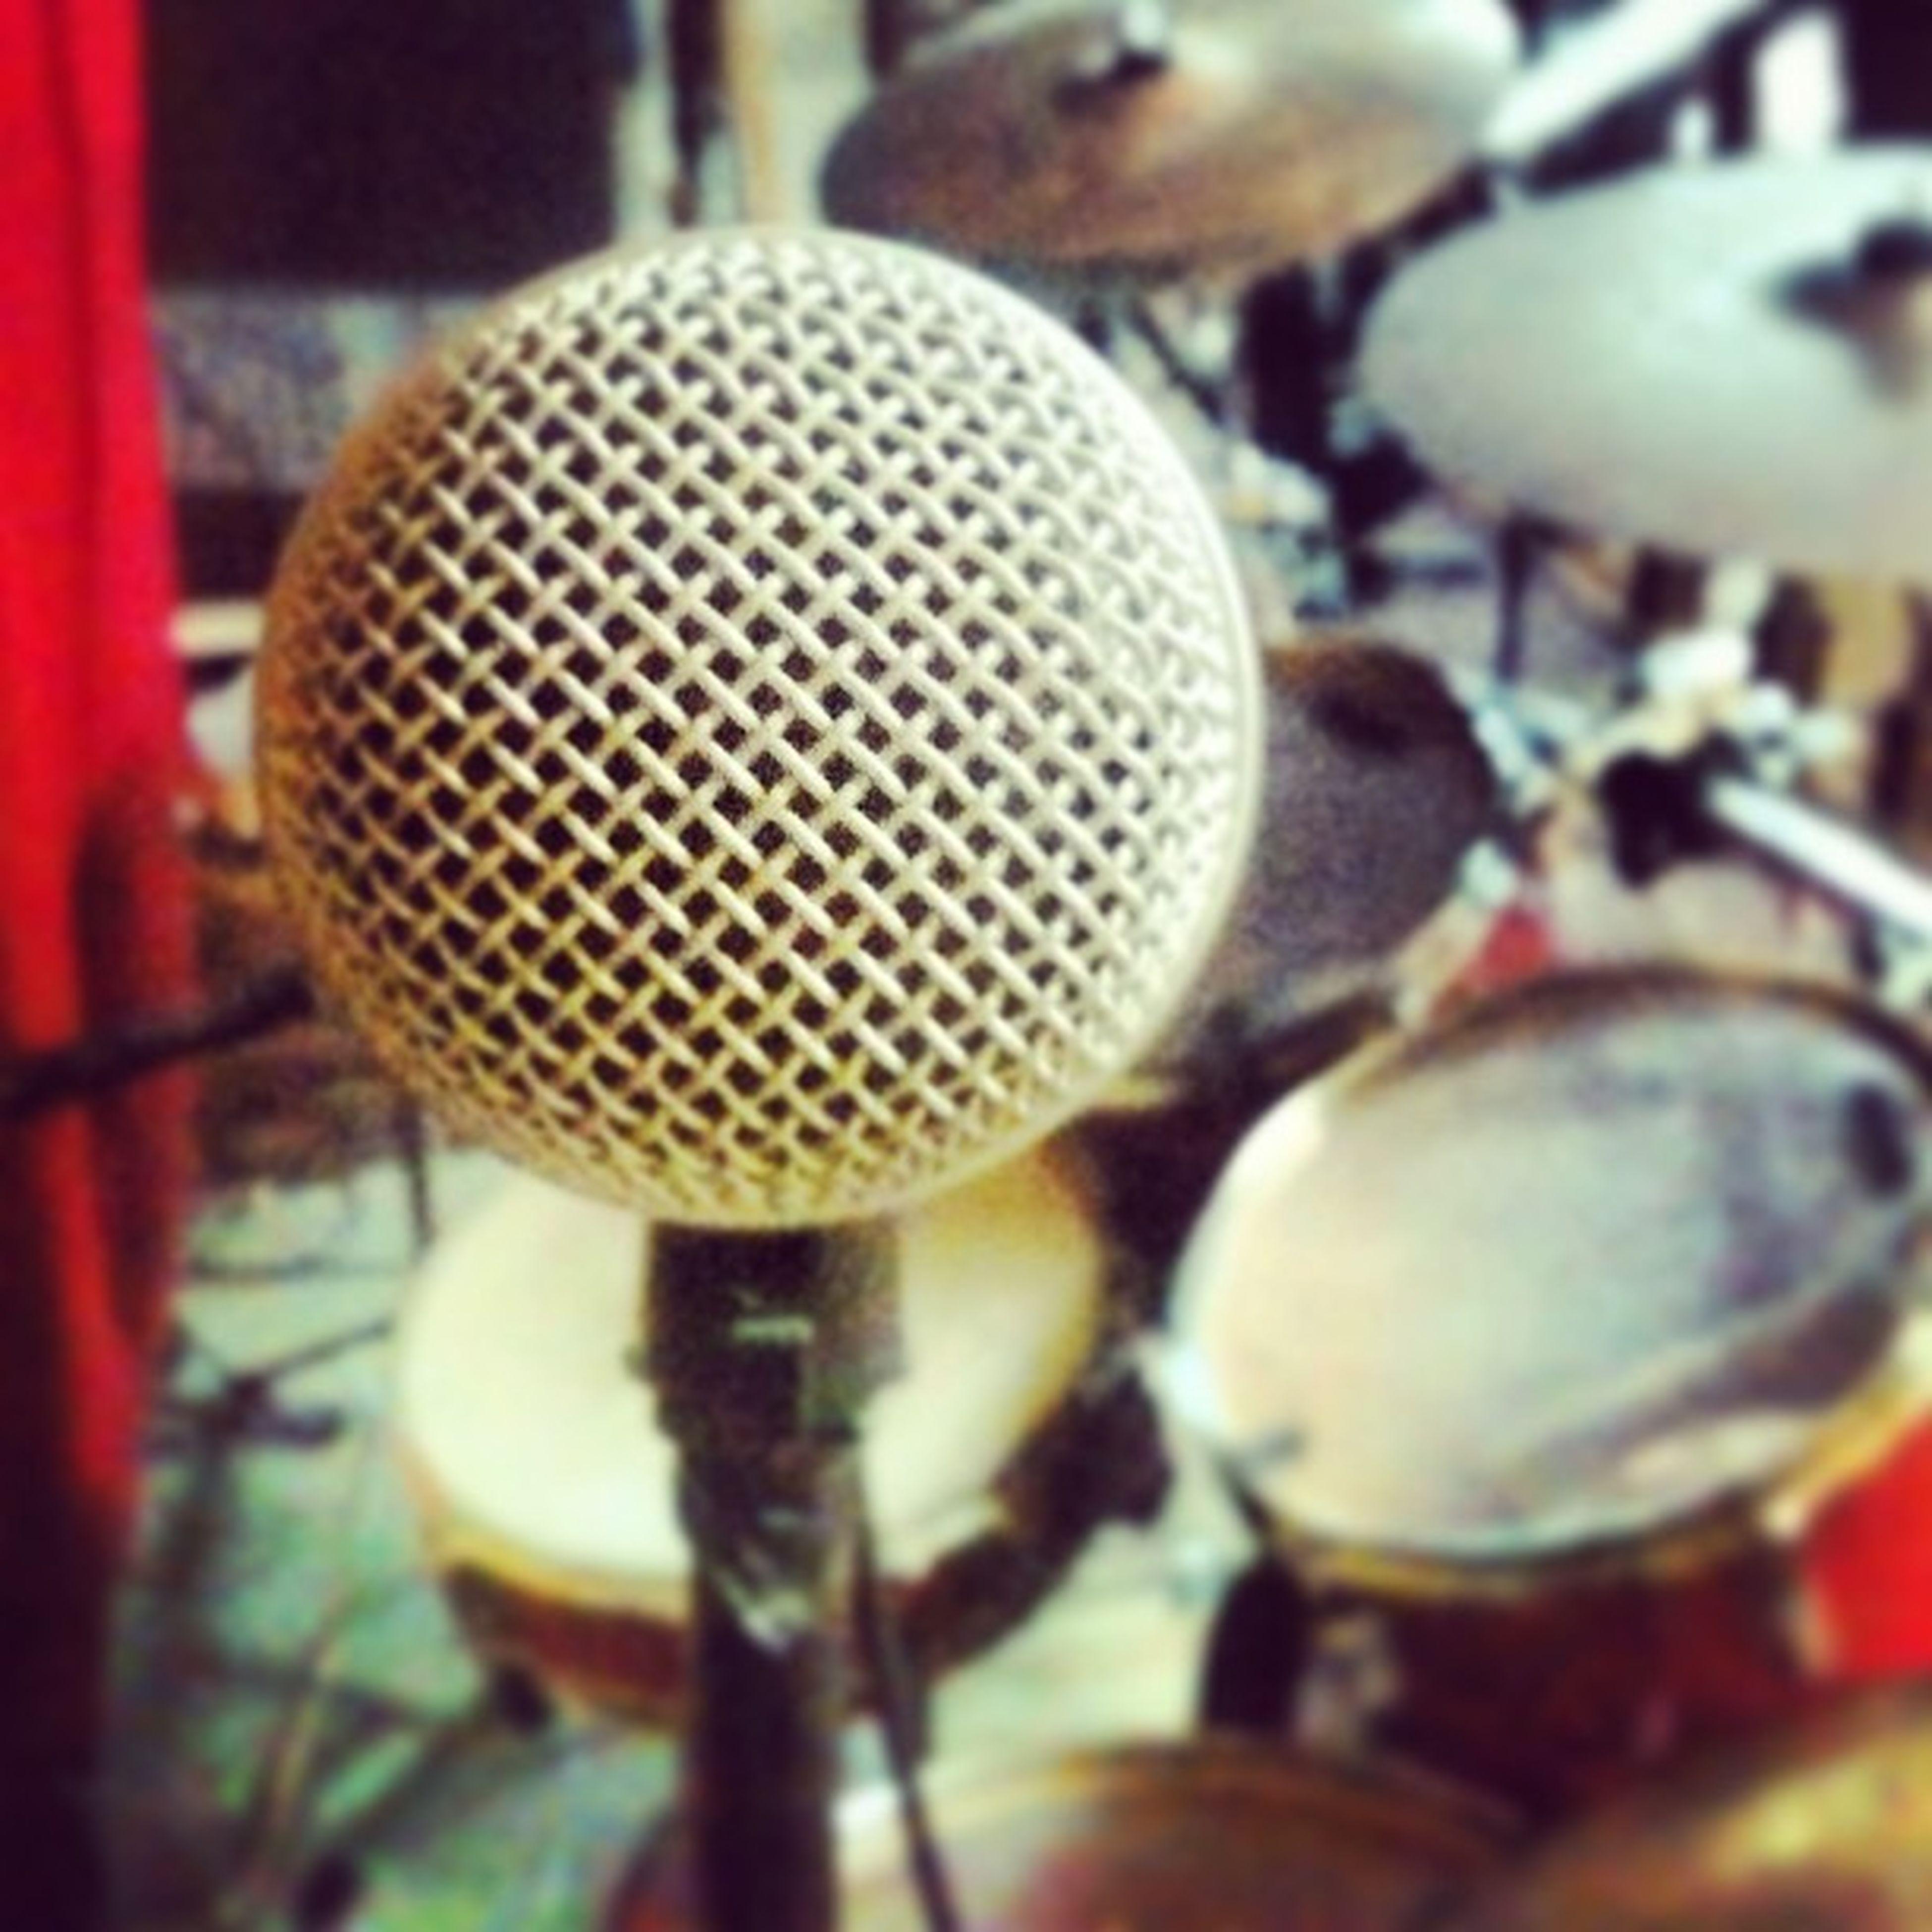 Microphone Drums Stage Music Instdrums Ensayo Fun Mextagram Audio